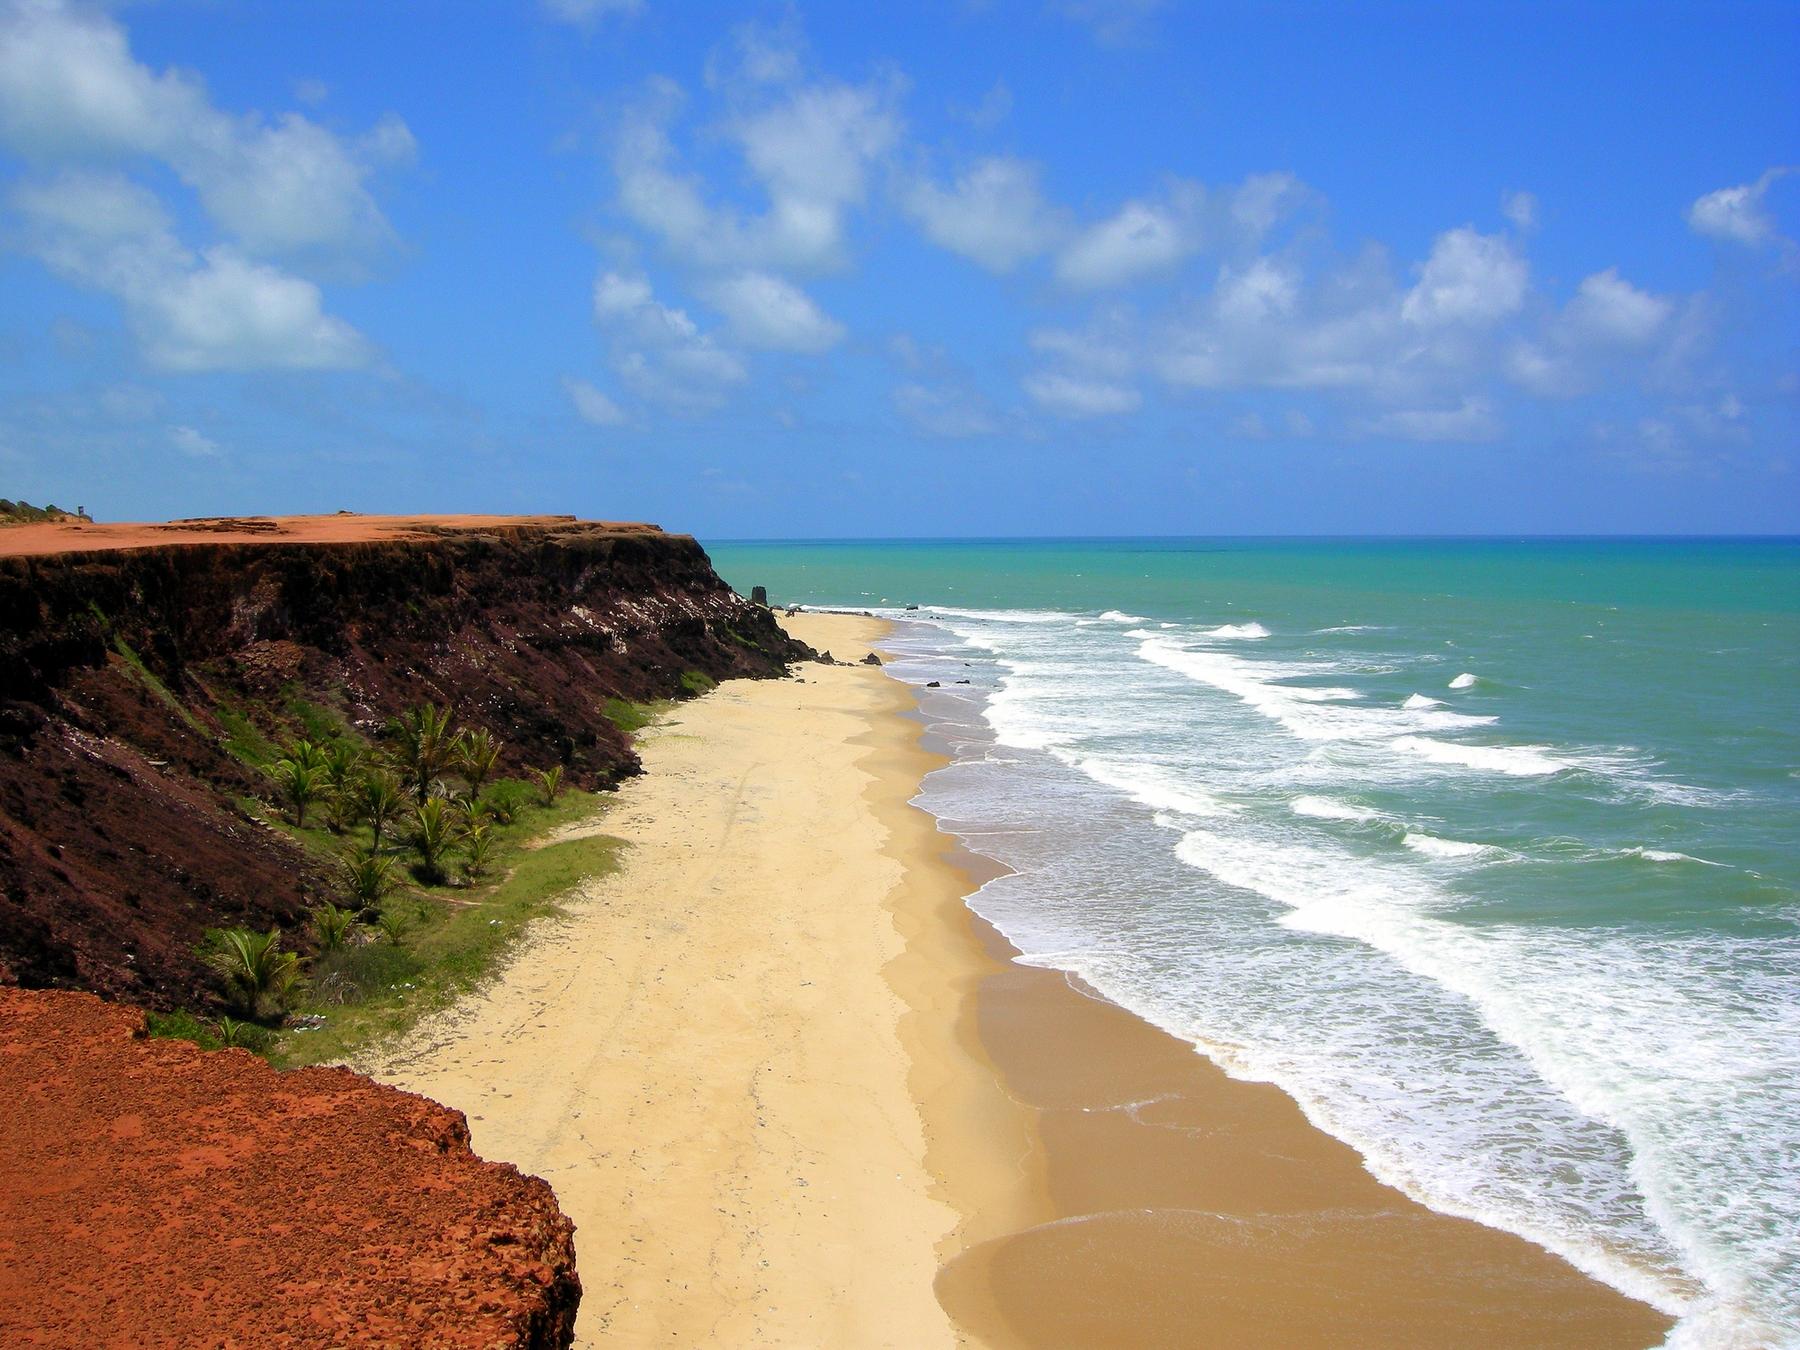 playa de Pipa Brasil viaje en marzo